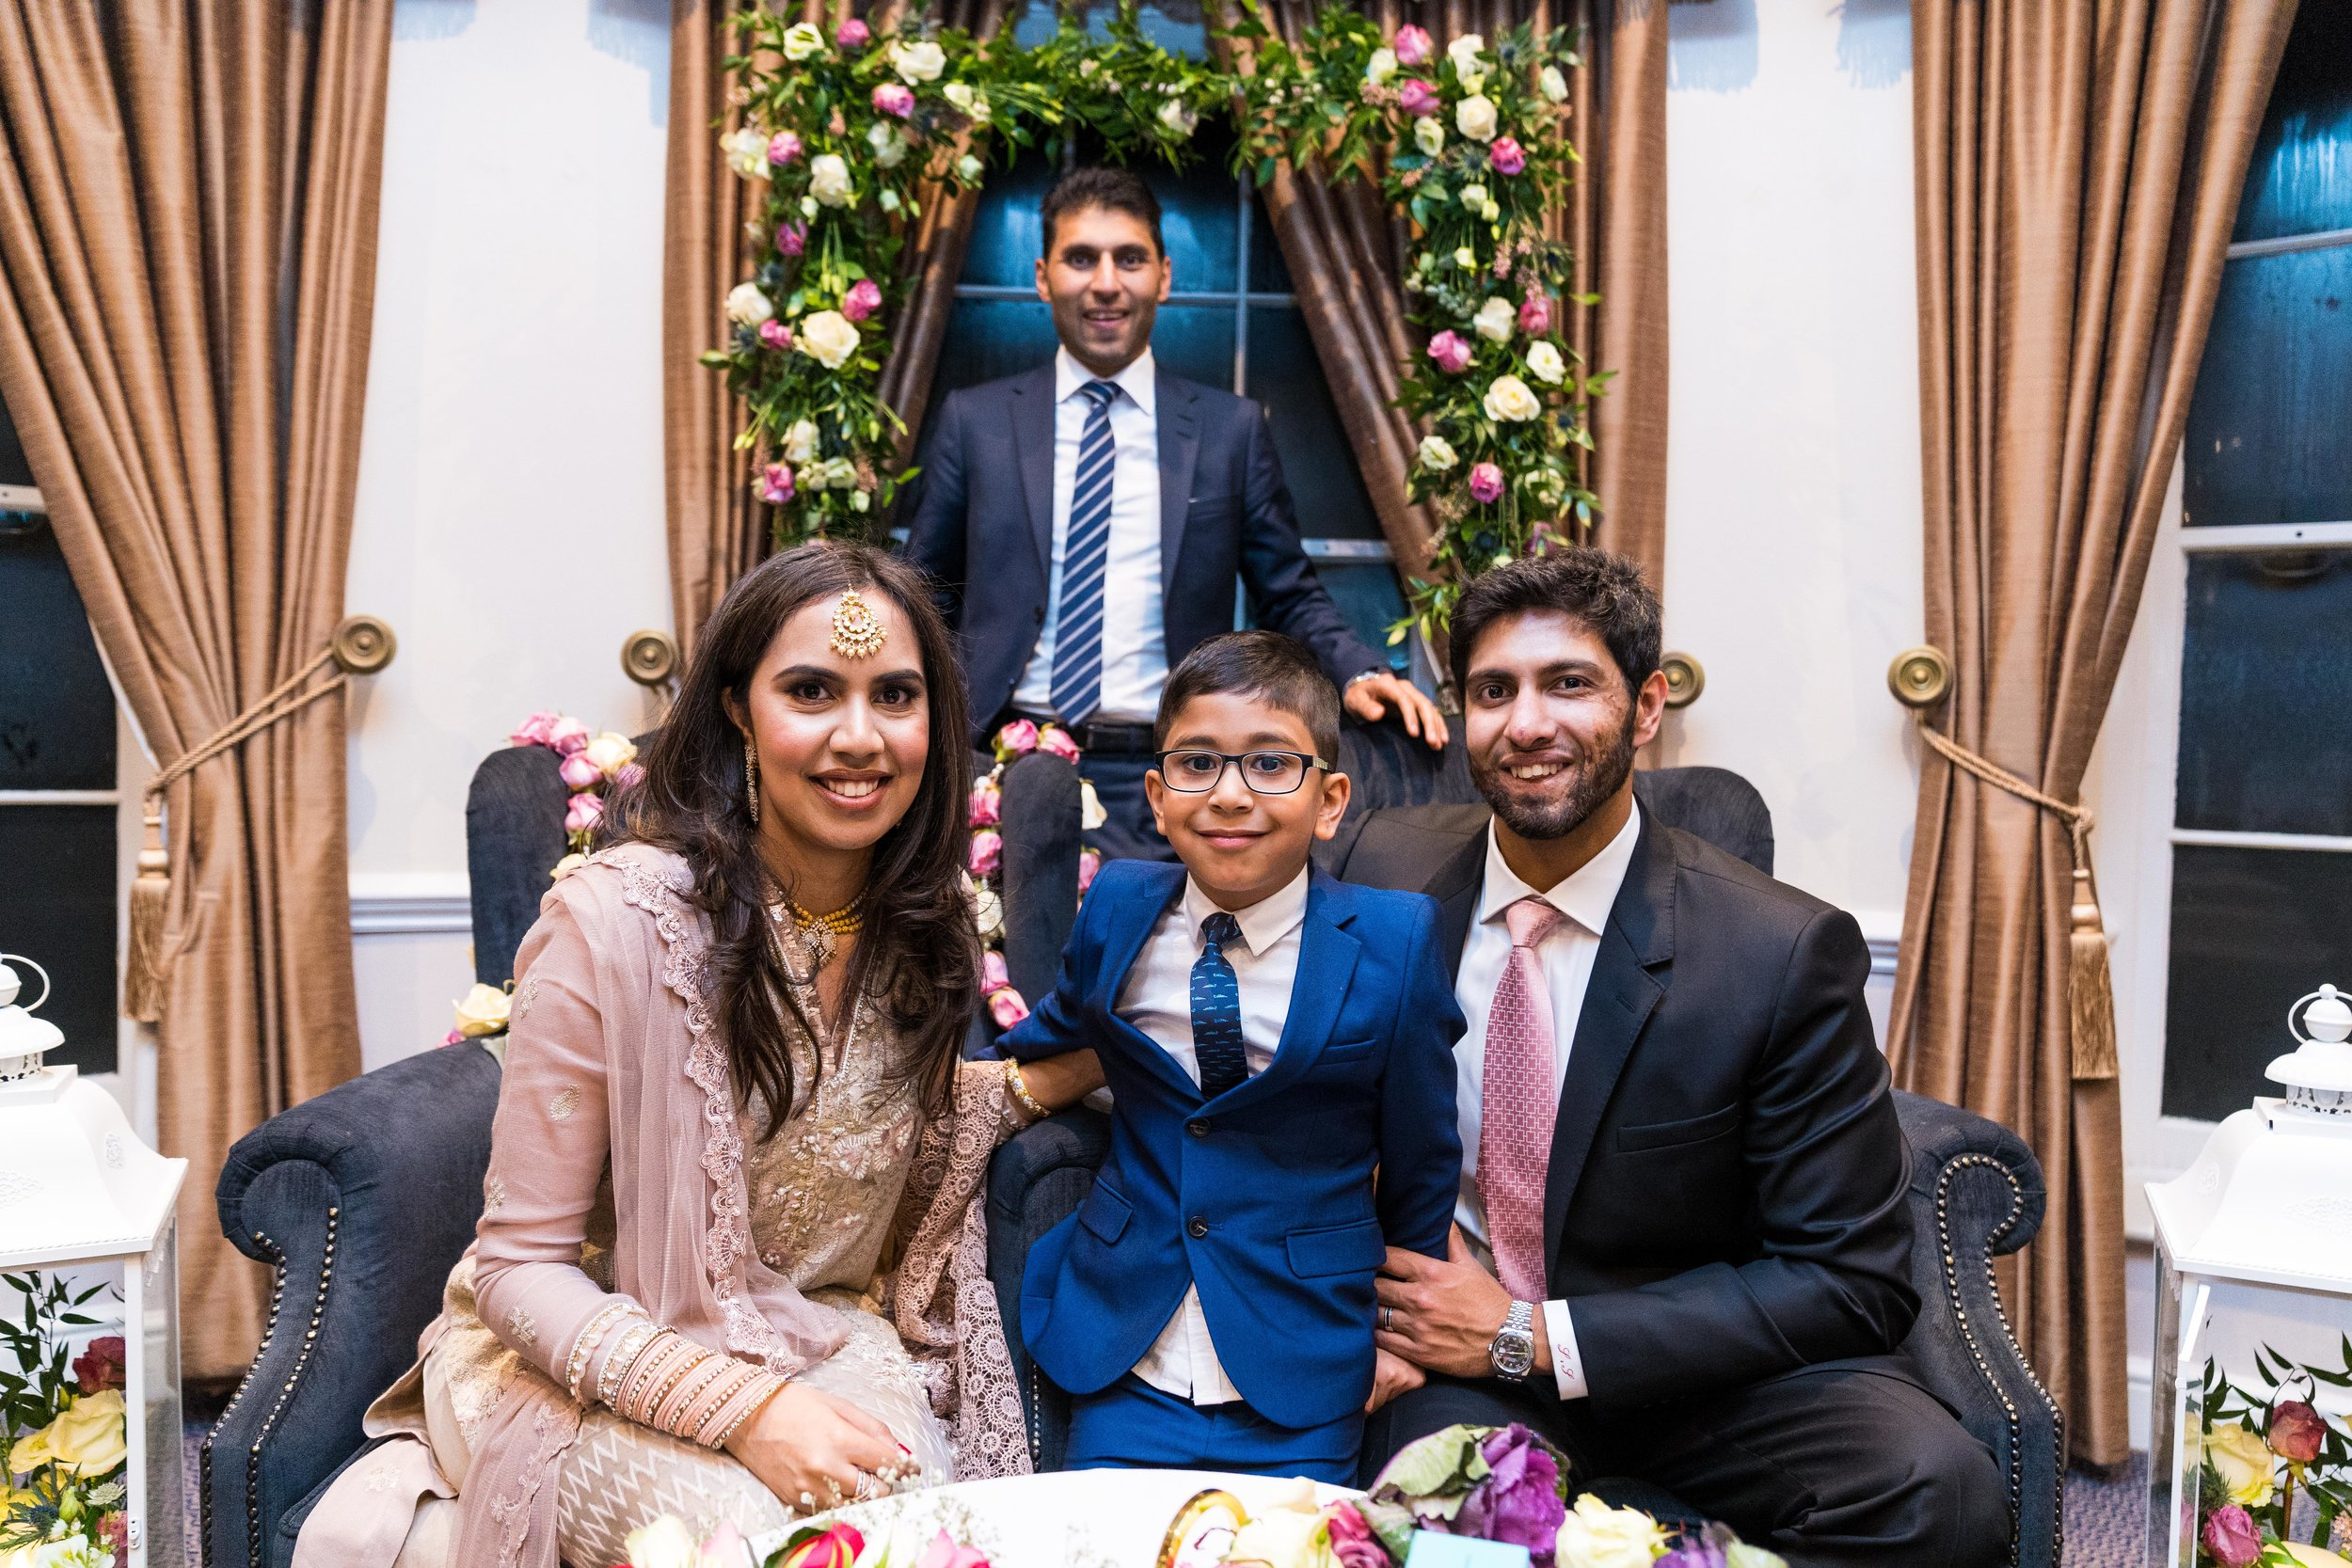 buckinghamshire-golf-club-winter-muslim-wedding-engagement-photography-videography-39